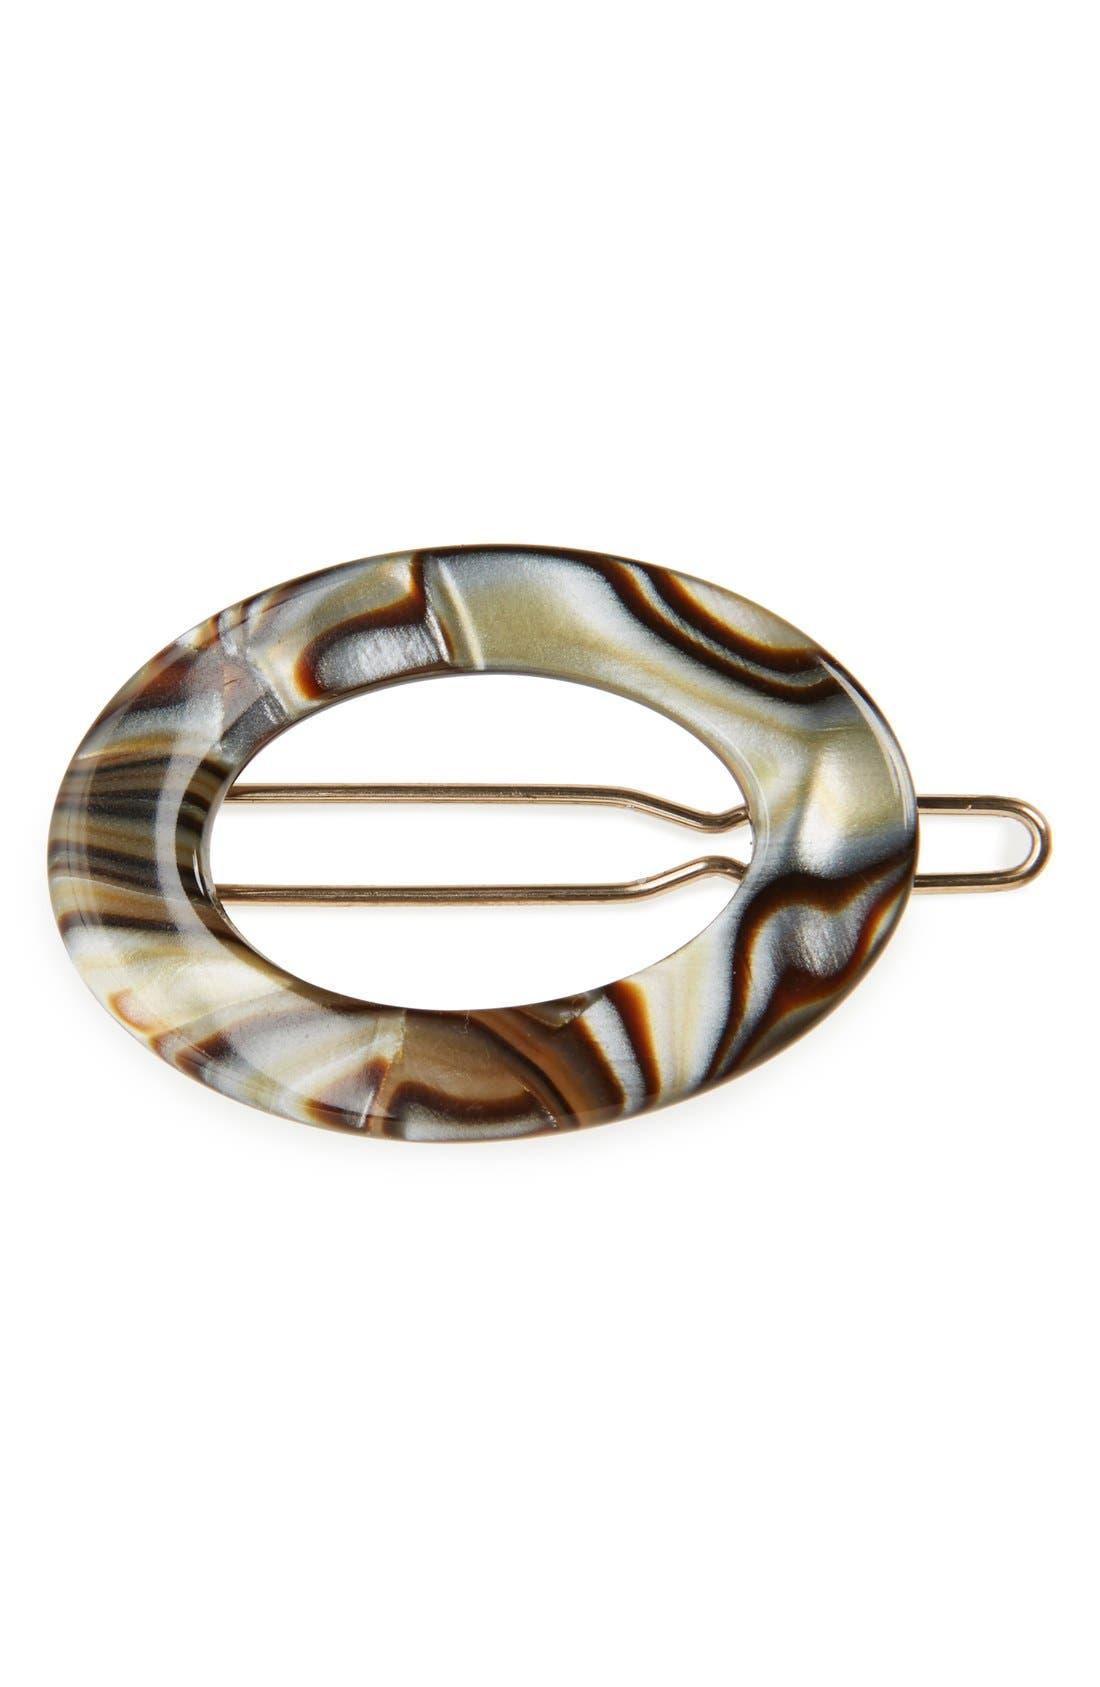 Oval Tige Boule Barrette,                             Main thumbnail 1, color,                             020